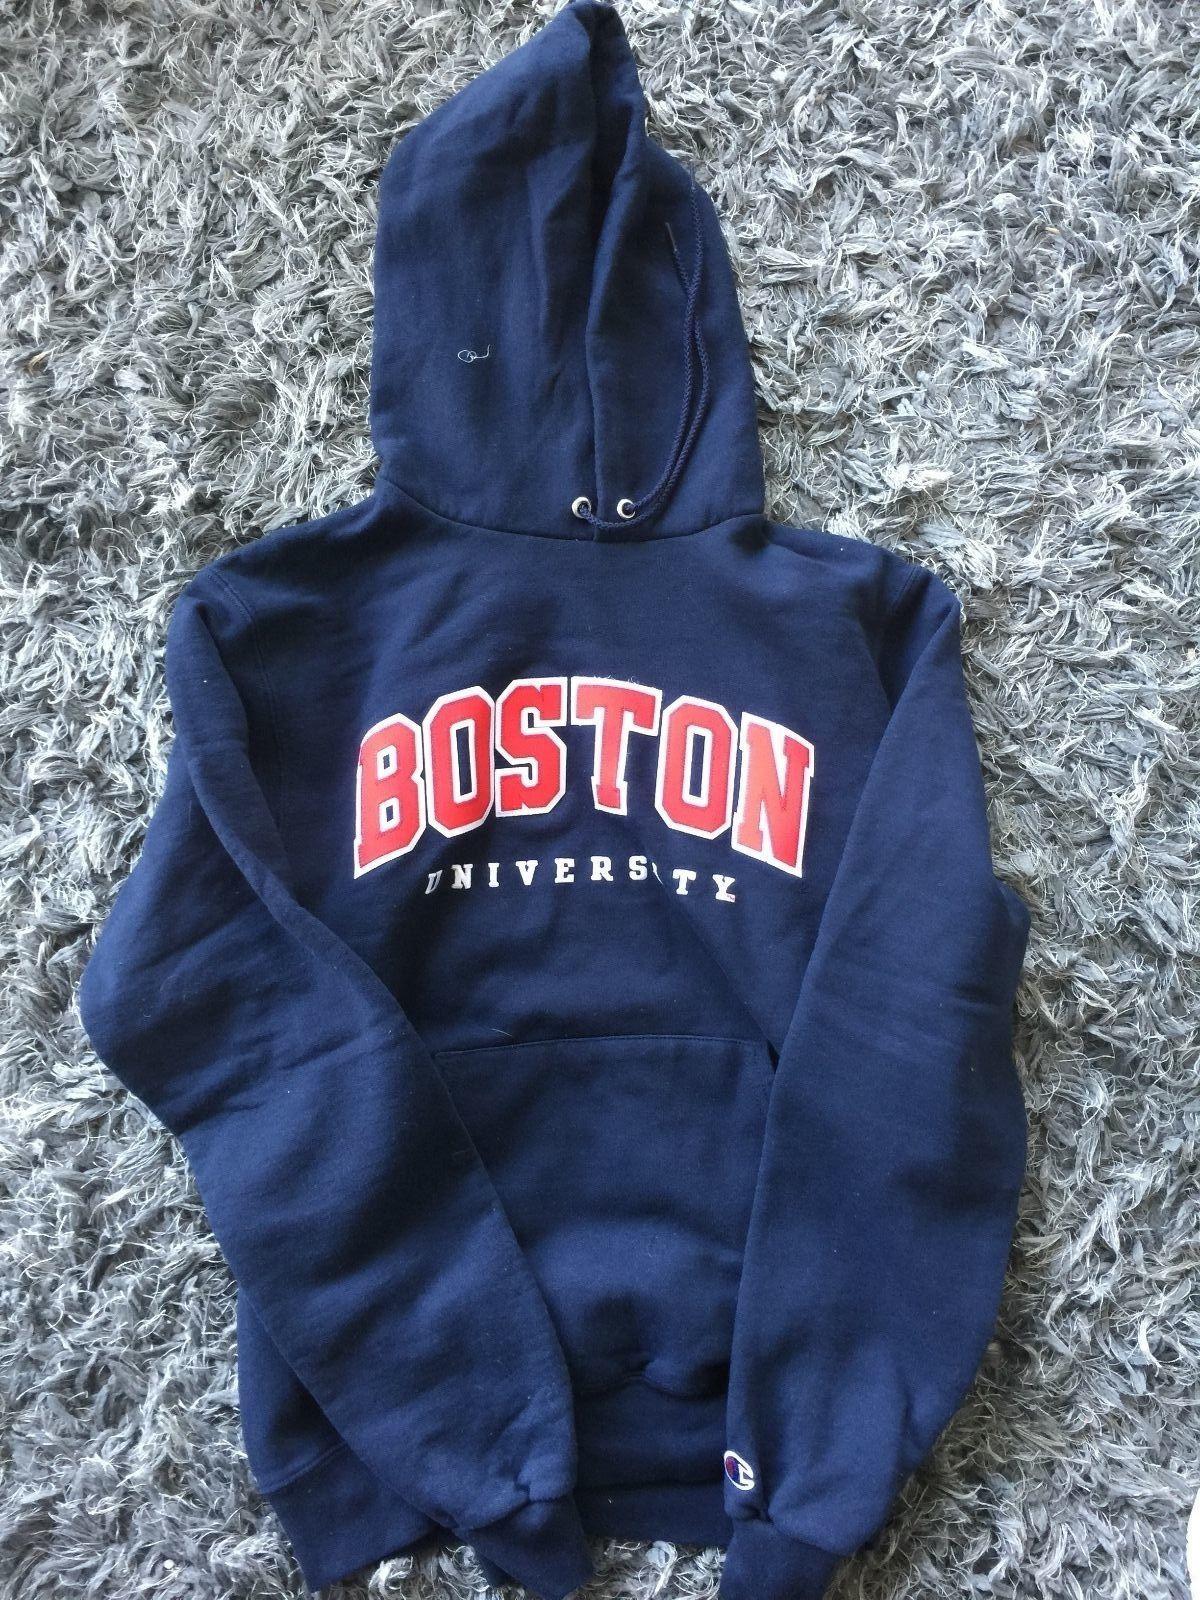 Vtg Boston University Blue Champion Reverse Weave Hoodie Sweatshirt Mens S Moletons Femininos Moletons Roupas [ 1600 x 1200 Pixel ]